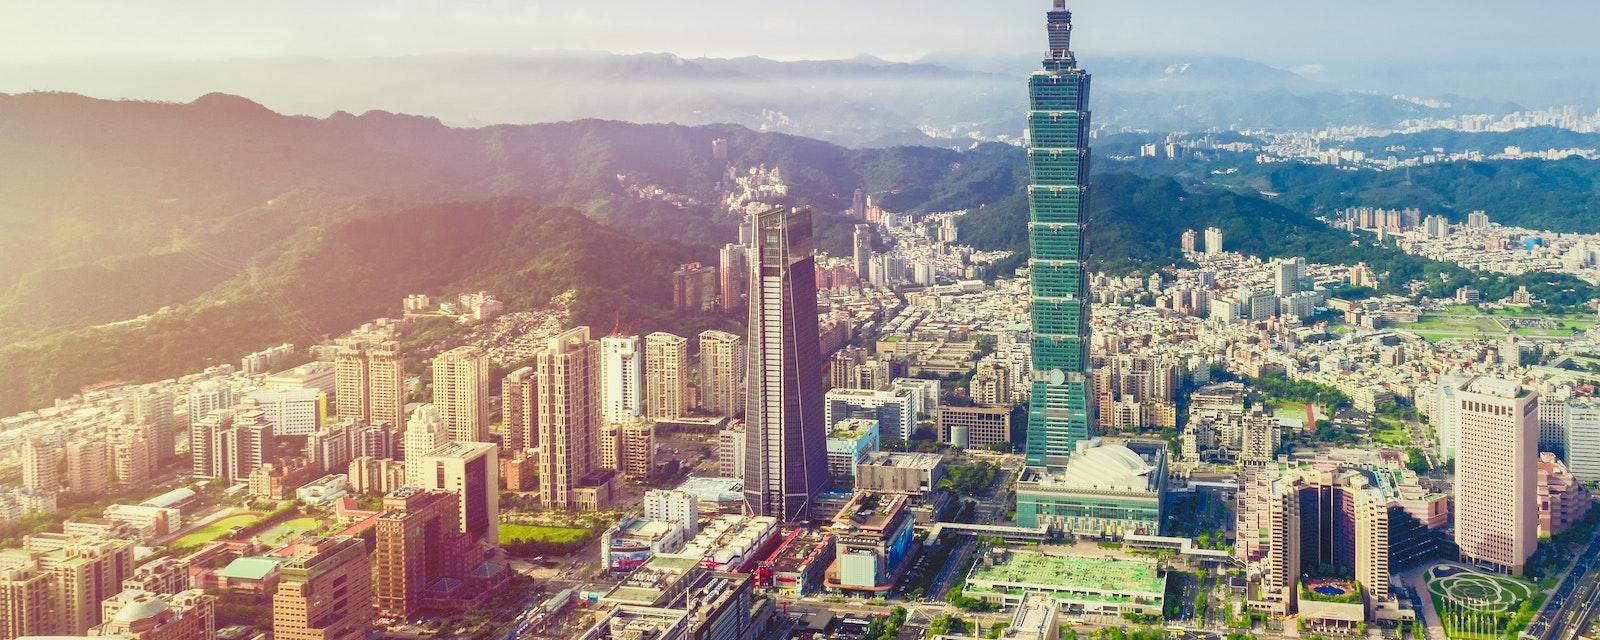 Sunrise,Of,Taipei,City,At,Dawn,With,Taipei,101,And